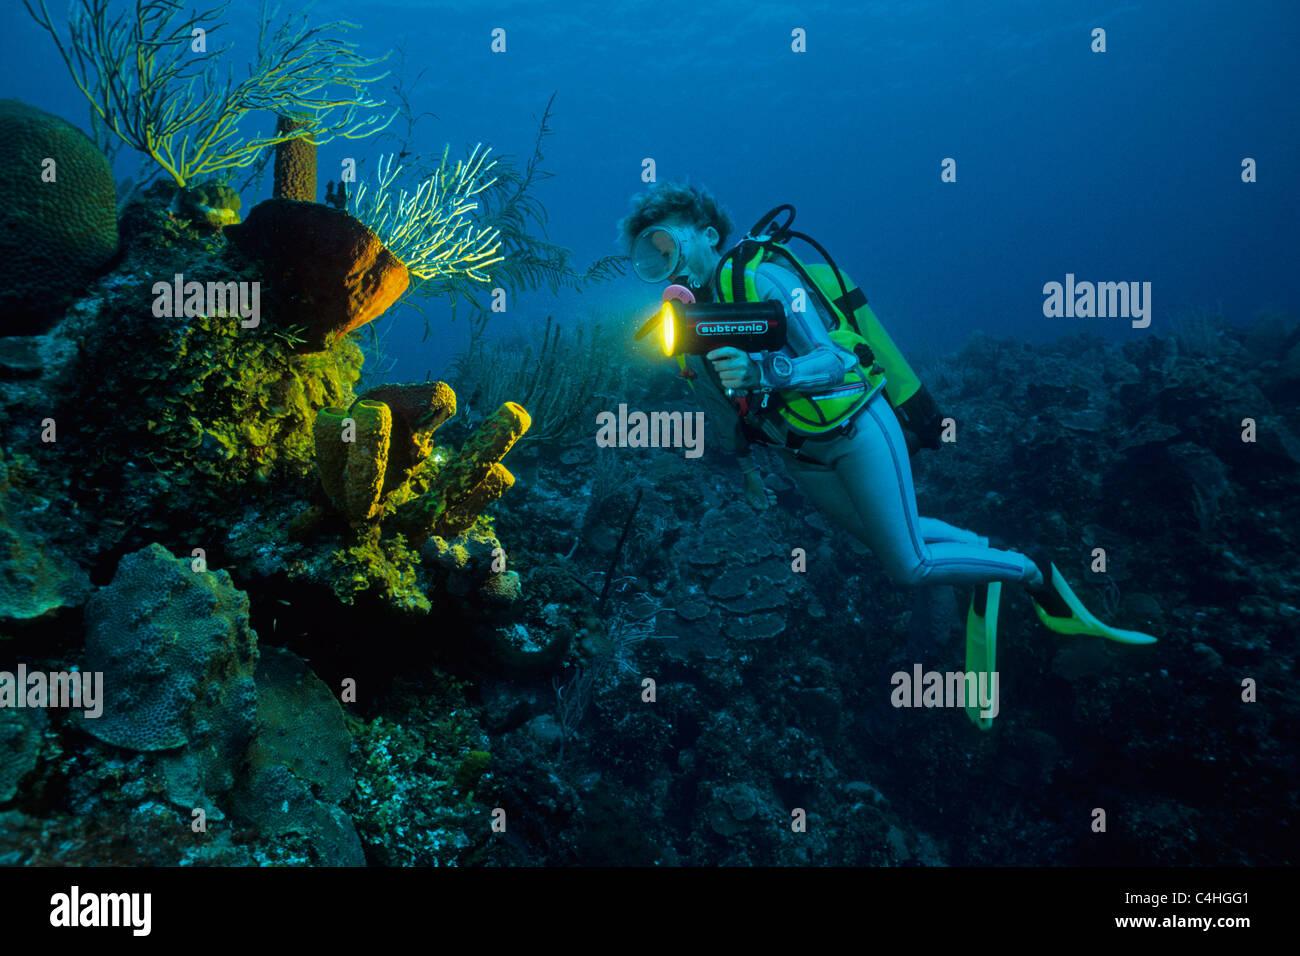 Scuba diver at sponges, caribbean coral reef, Cuba, Caribbean sea - Stock Image